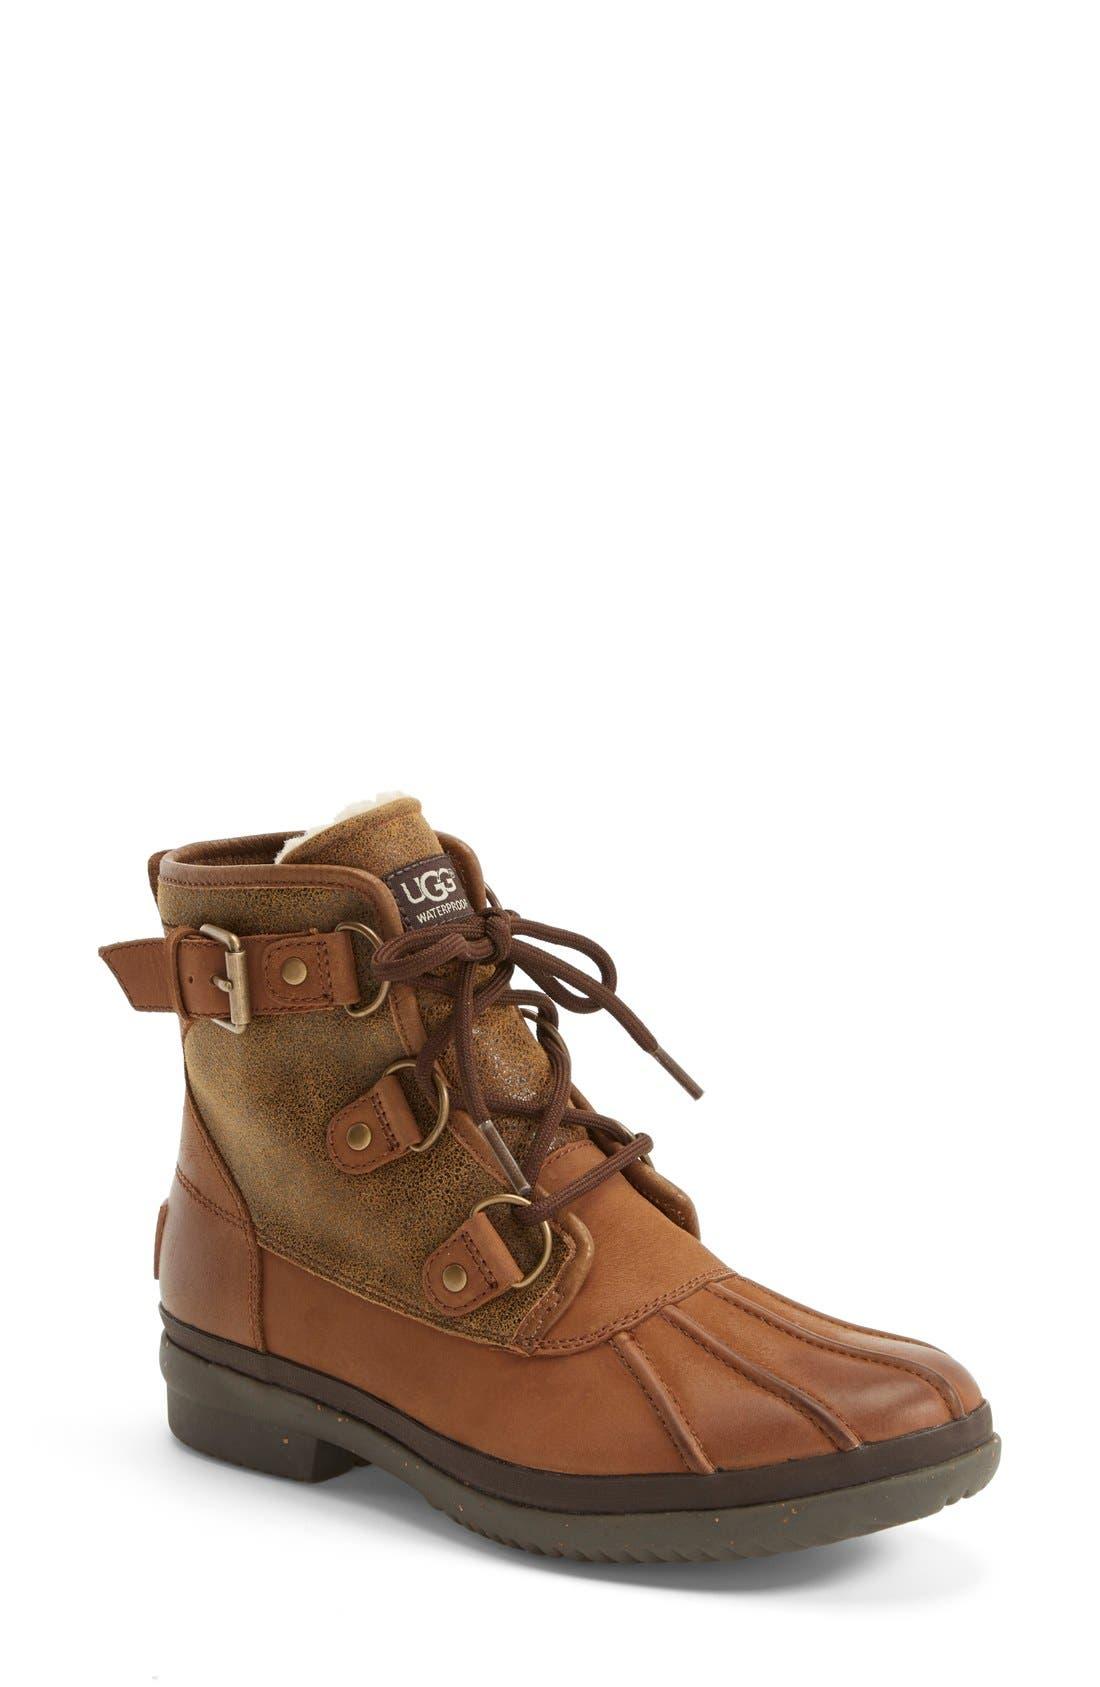 Main Image - UGG® Cecile Waterproof Boot (Women)